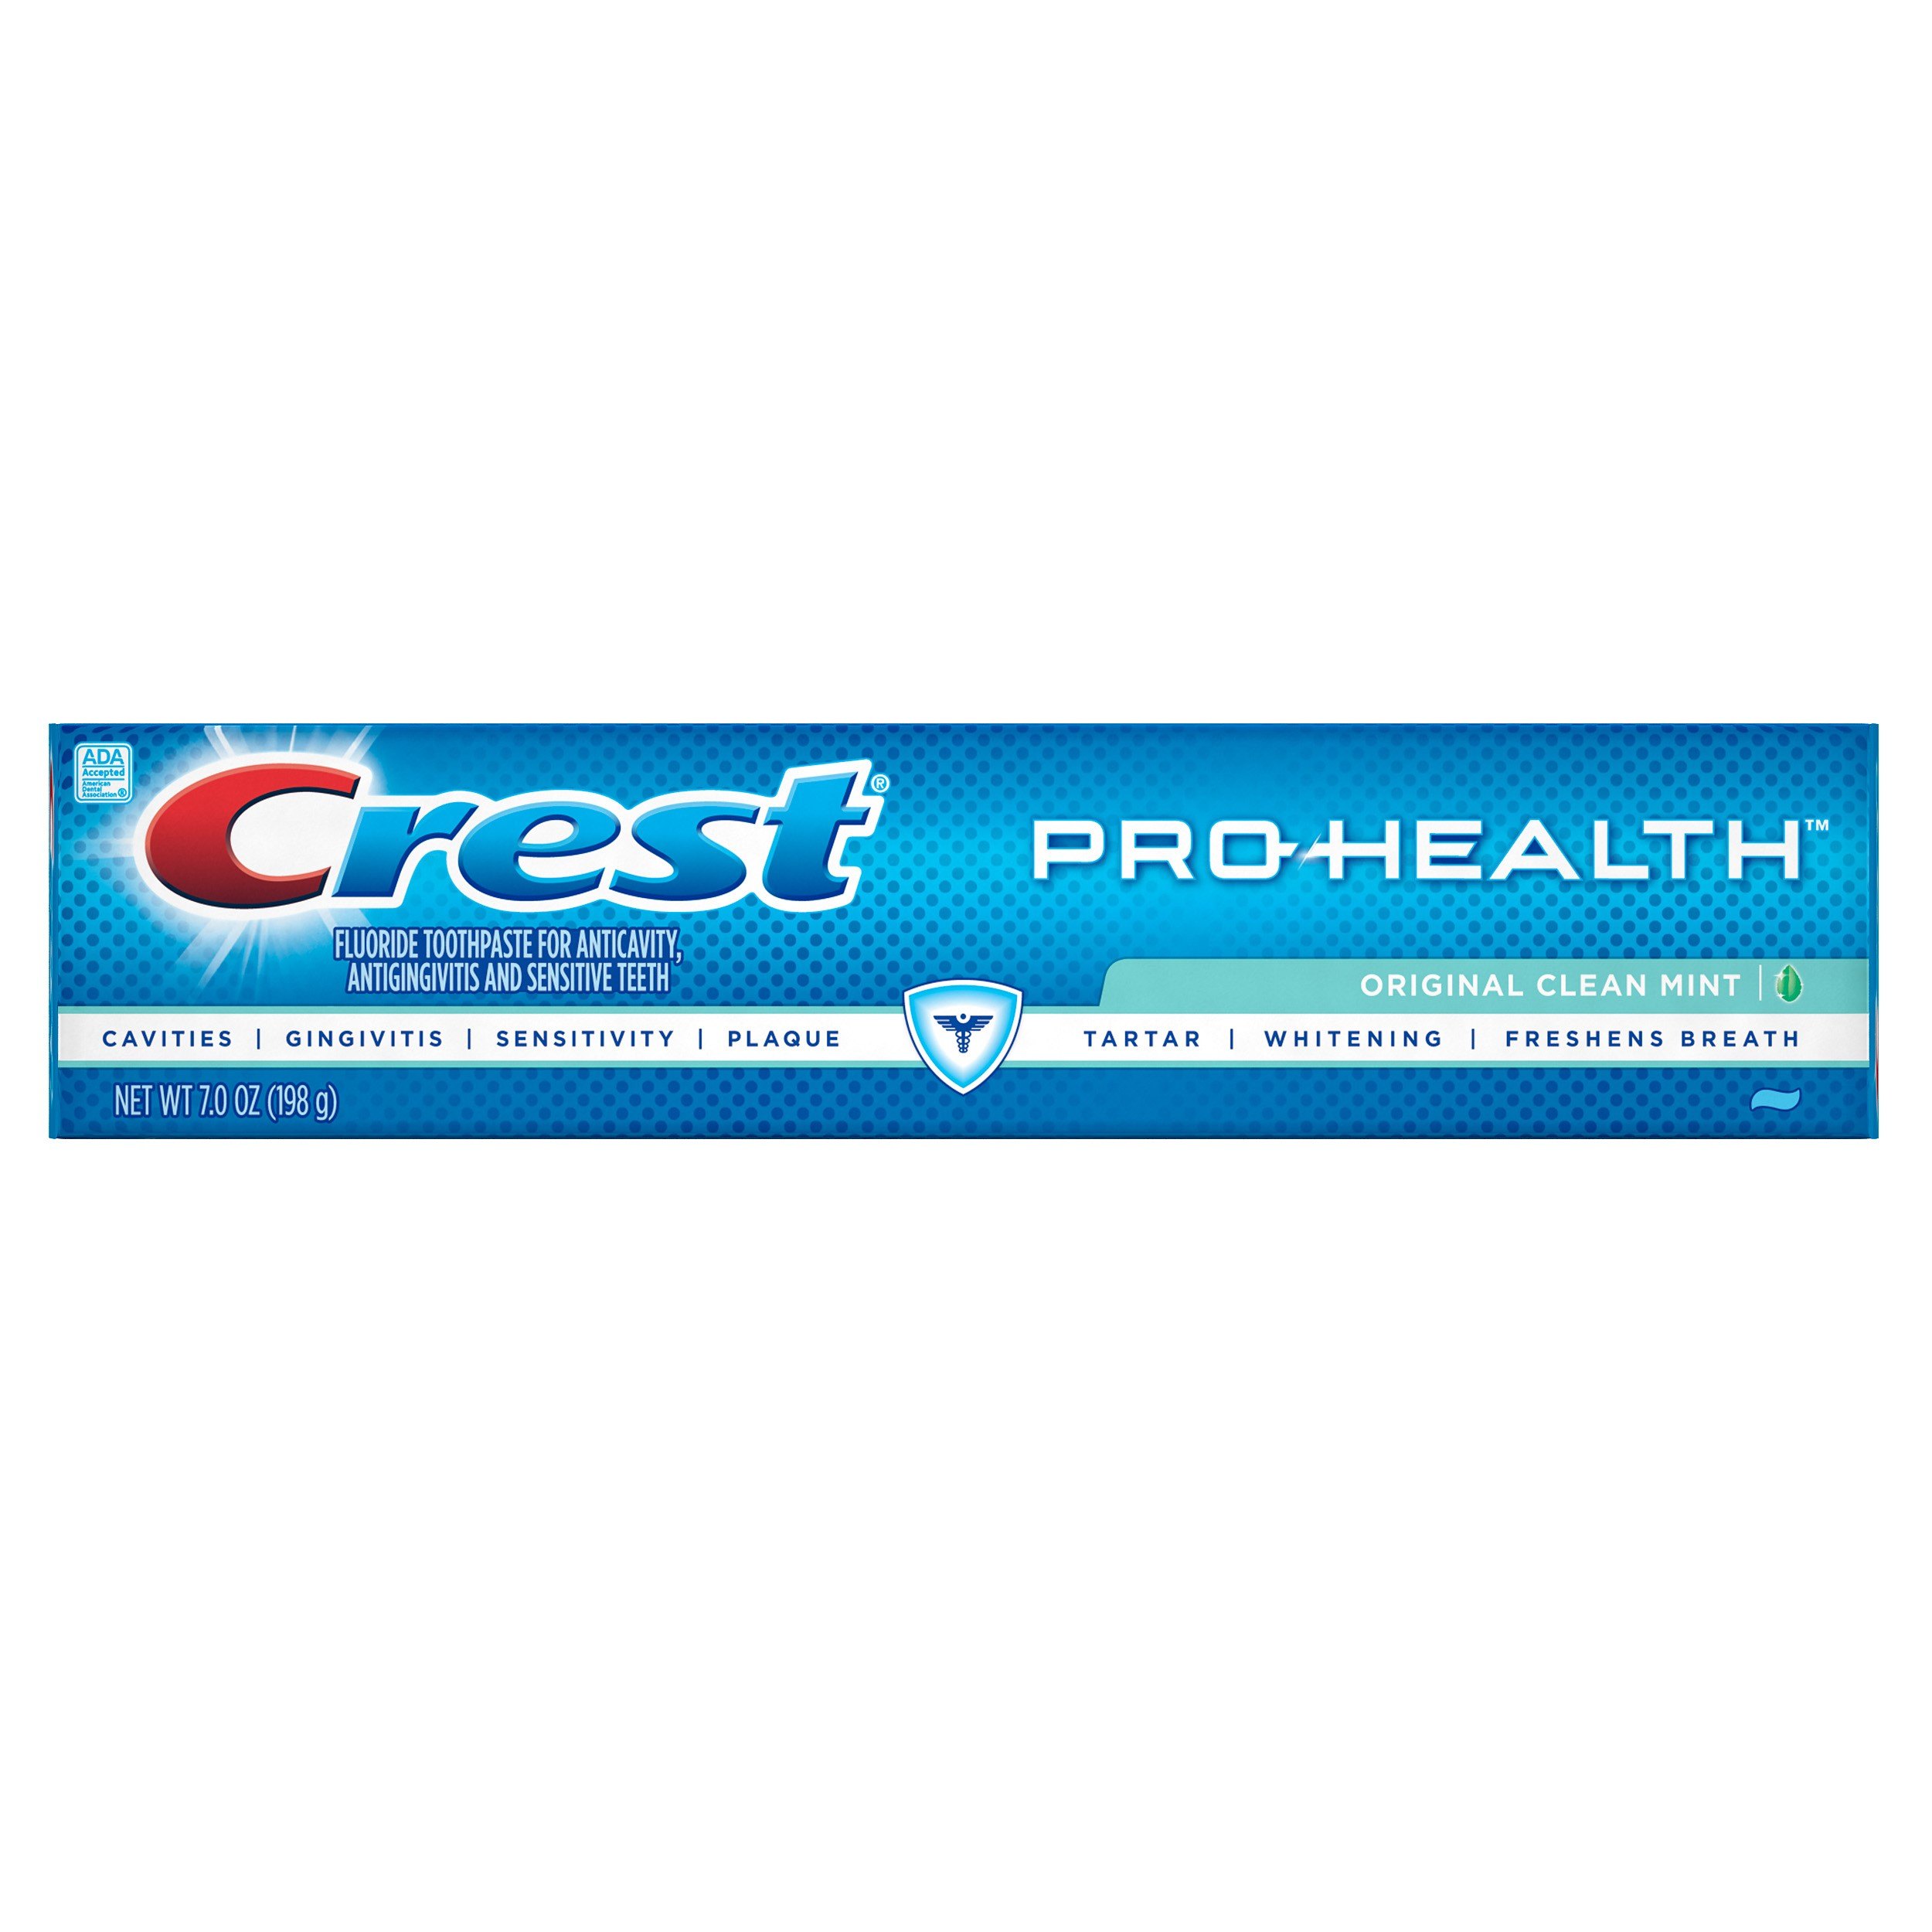 Crest Pro-Health Original Clean Mint Flavor Toothpaste 7.0 oz.